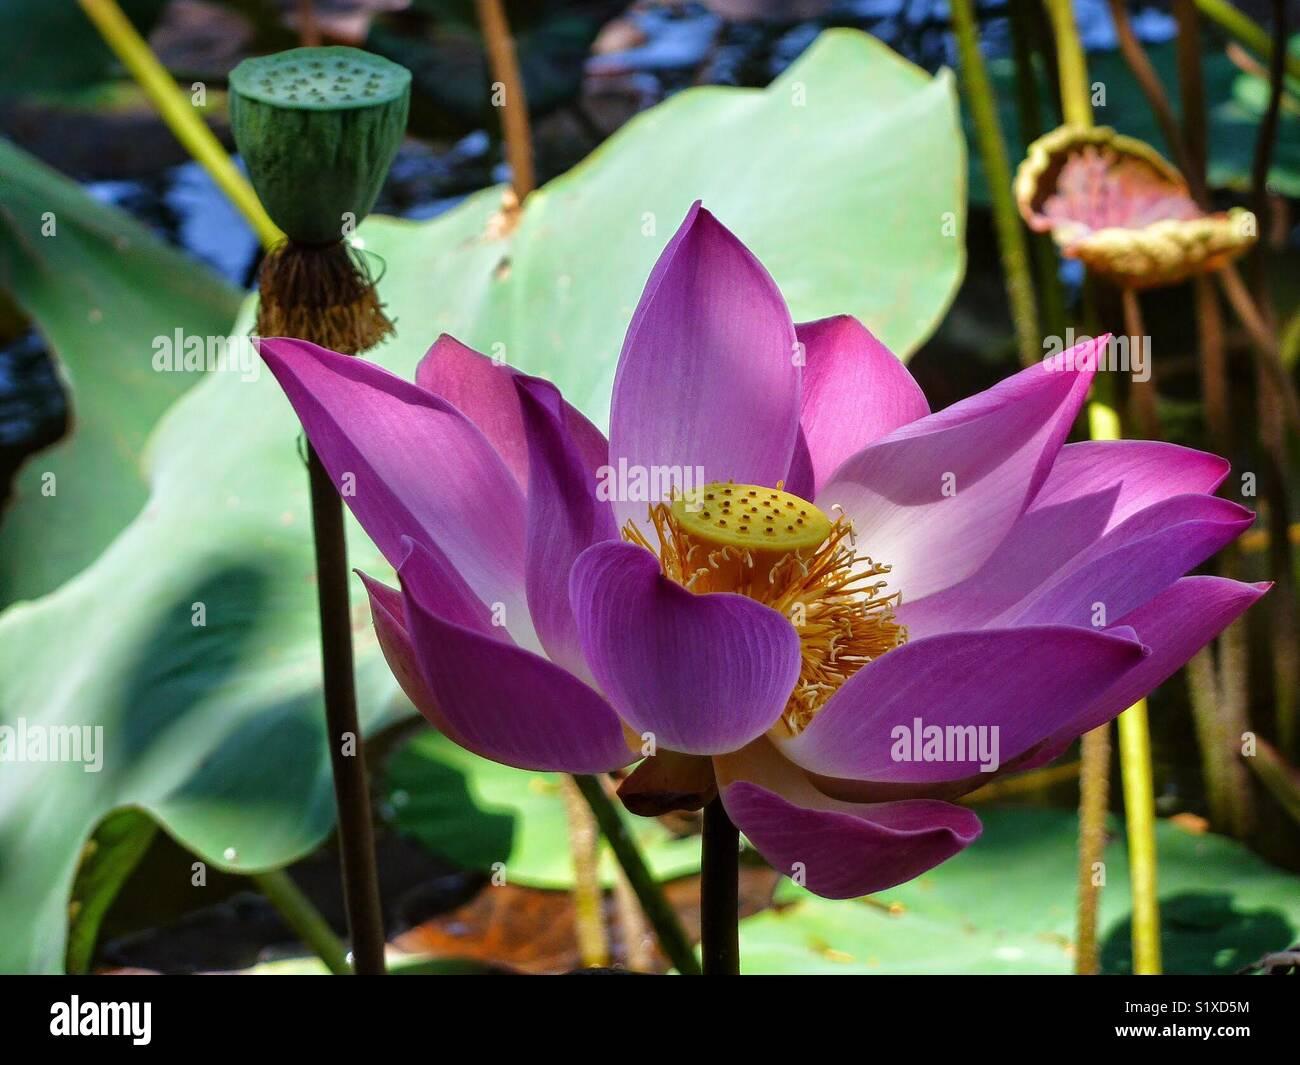 Amazing catch of a lotus flower in bali indonsia stock photo amazing catch of a lotus flower in bali indonsia mightylinksfo